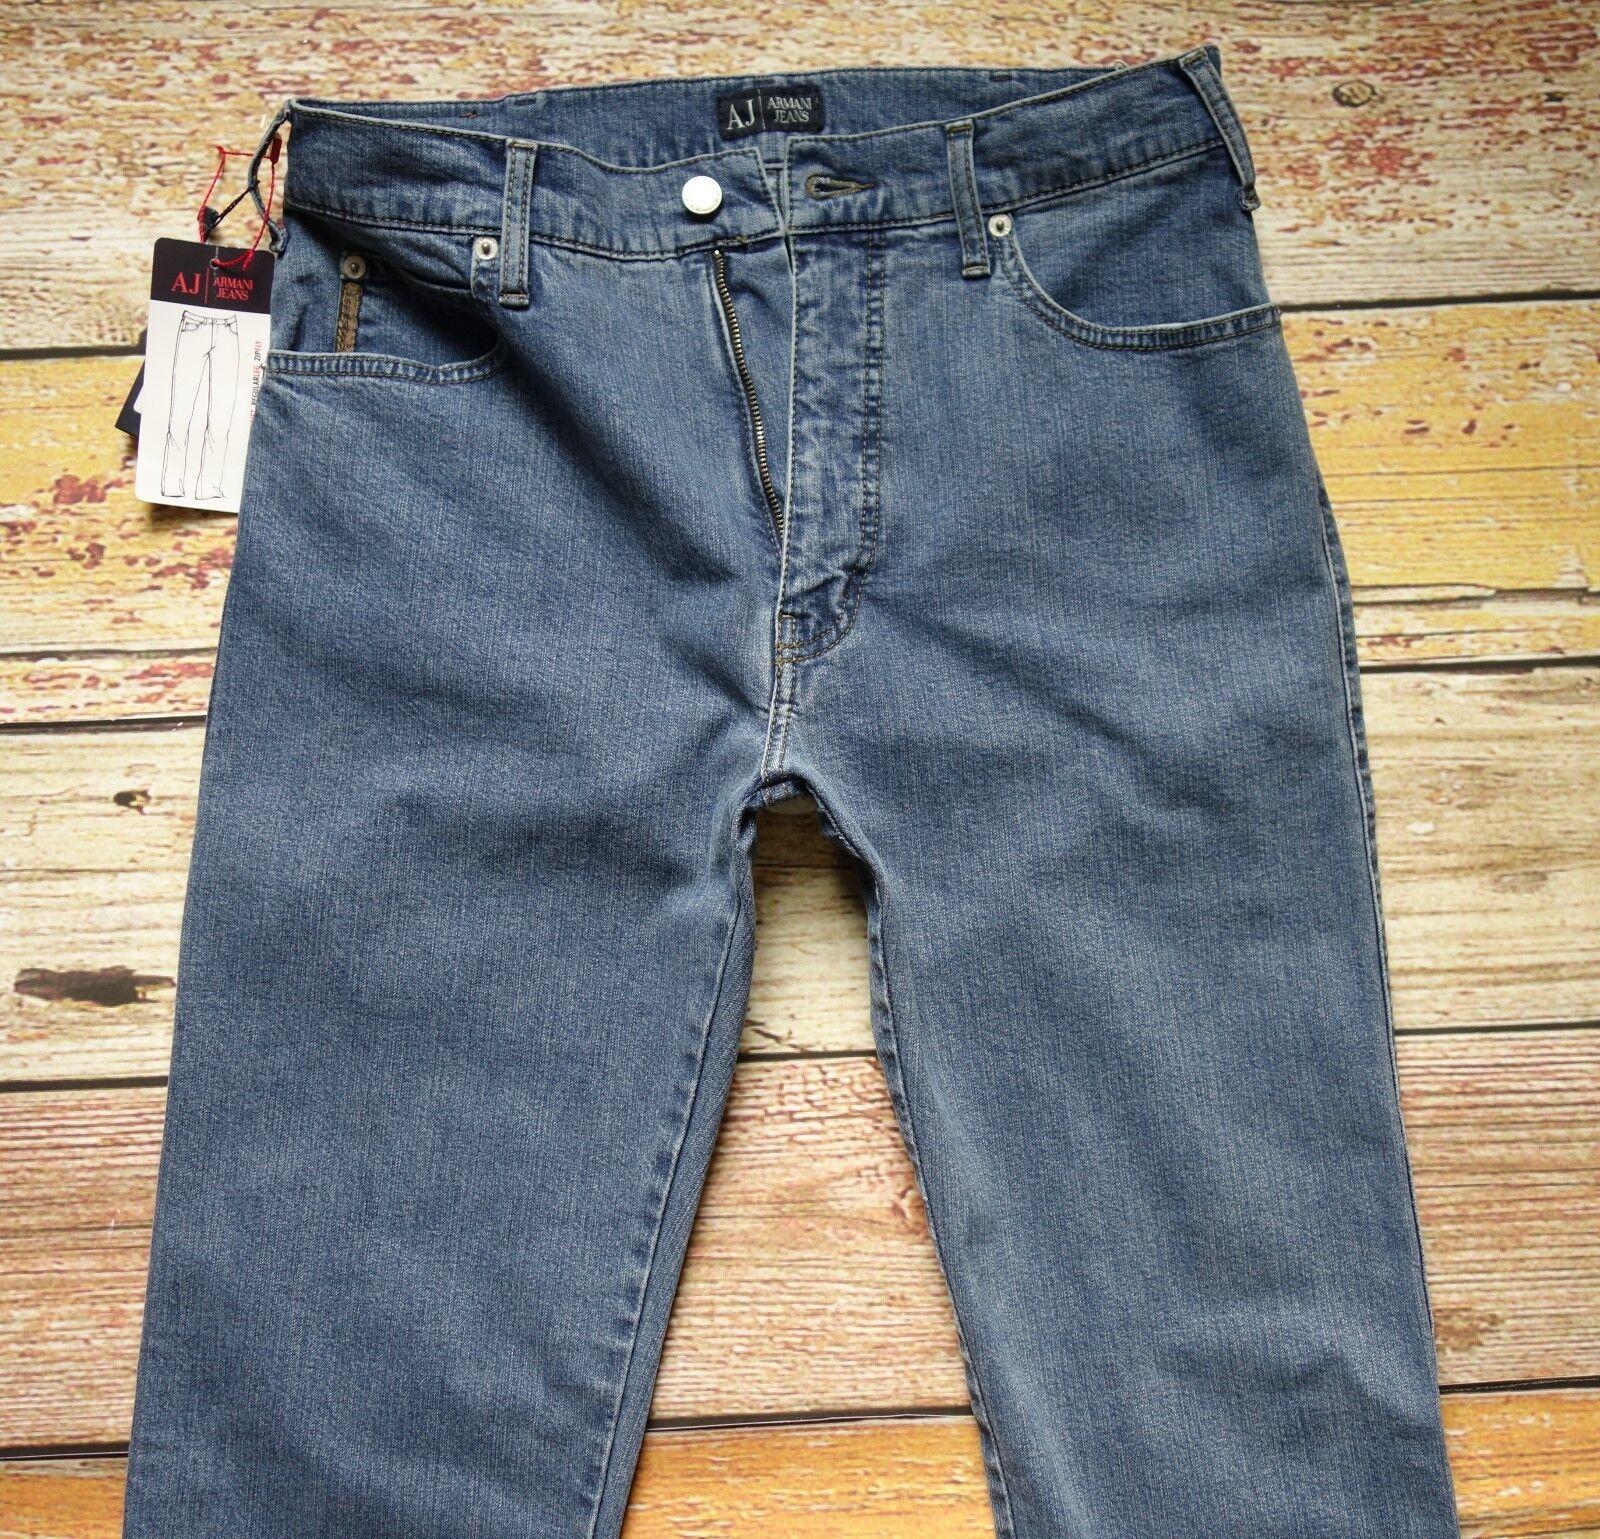 NEW AJ Armani Jeans W31xL34 Regular Fit High Waist Regular Leg Zip Fly Cotton